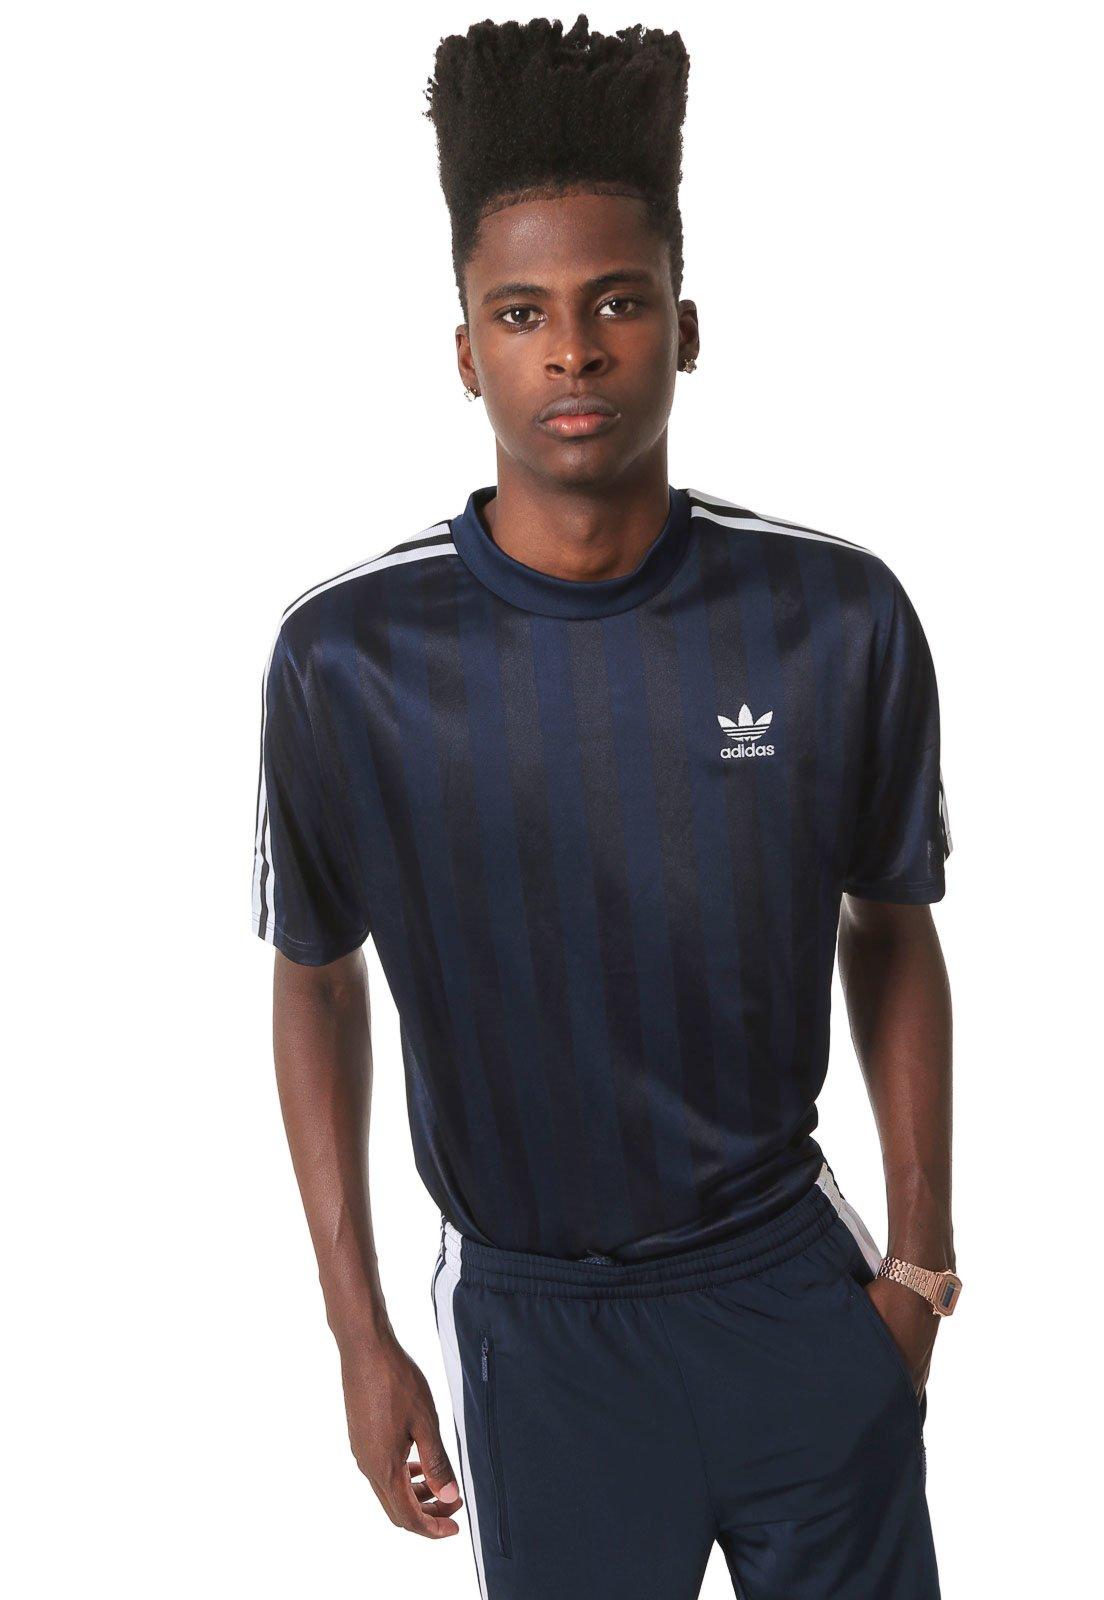 Hacia Hollywood Muscular  Camiseta adidas Originals B Side Jersey Azul-marinho - Compre Agora | Kanui  Brasil